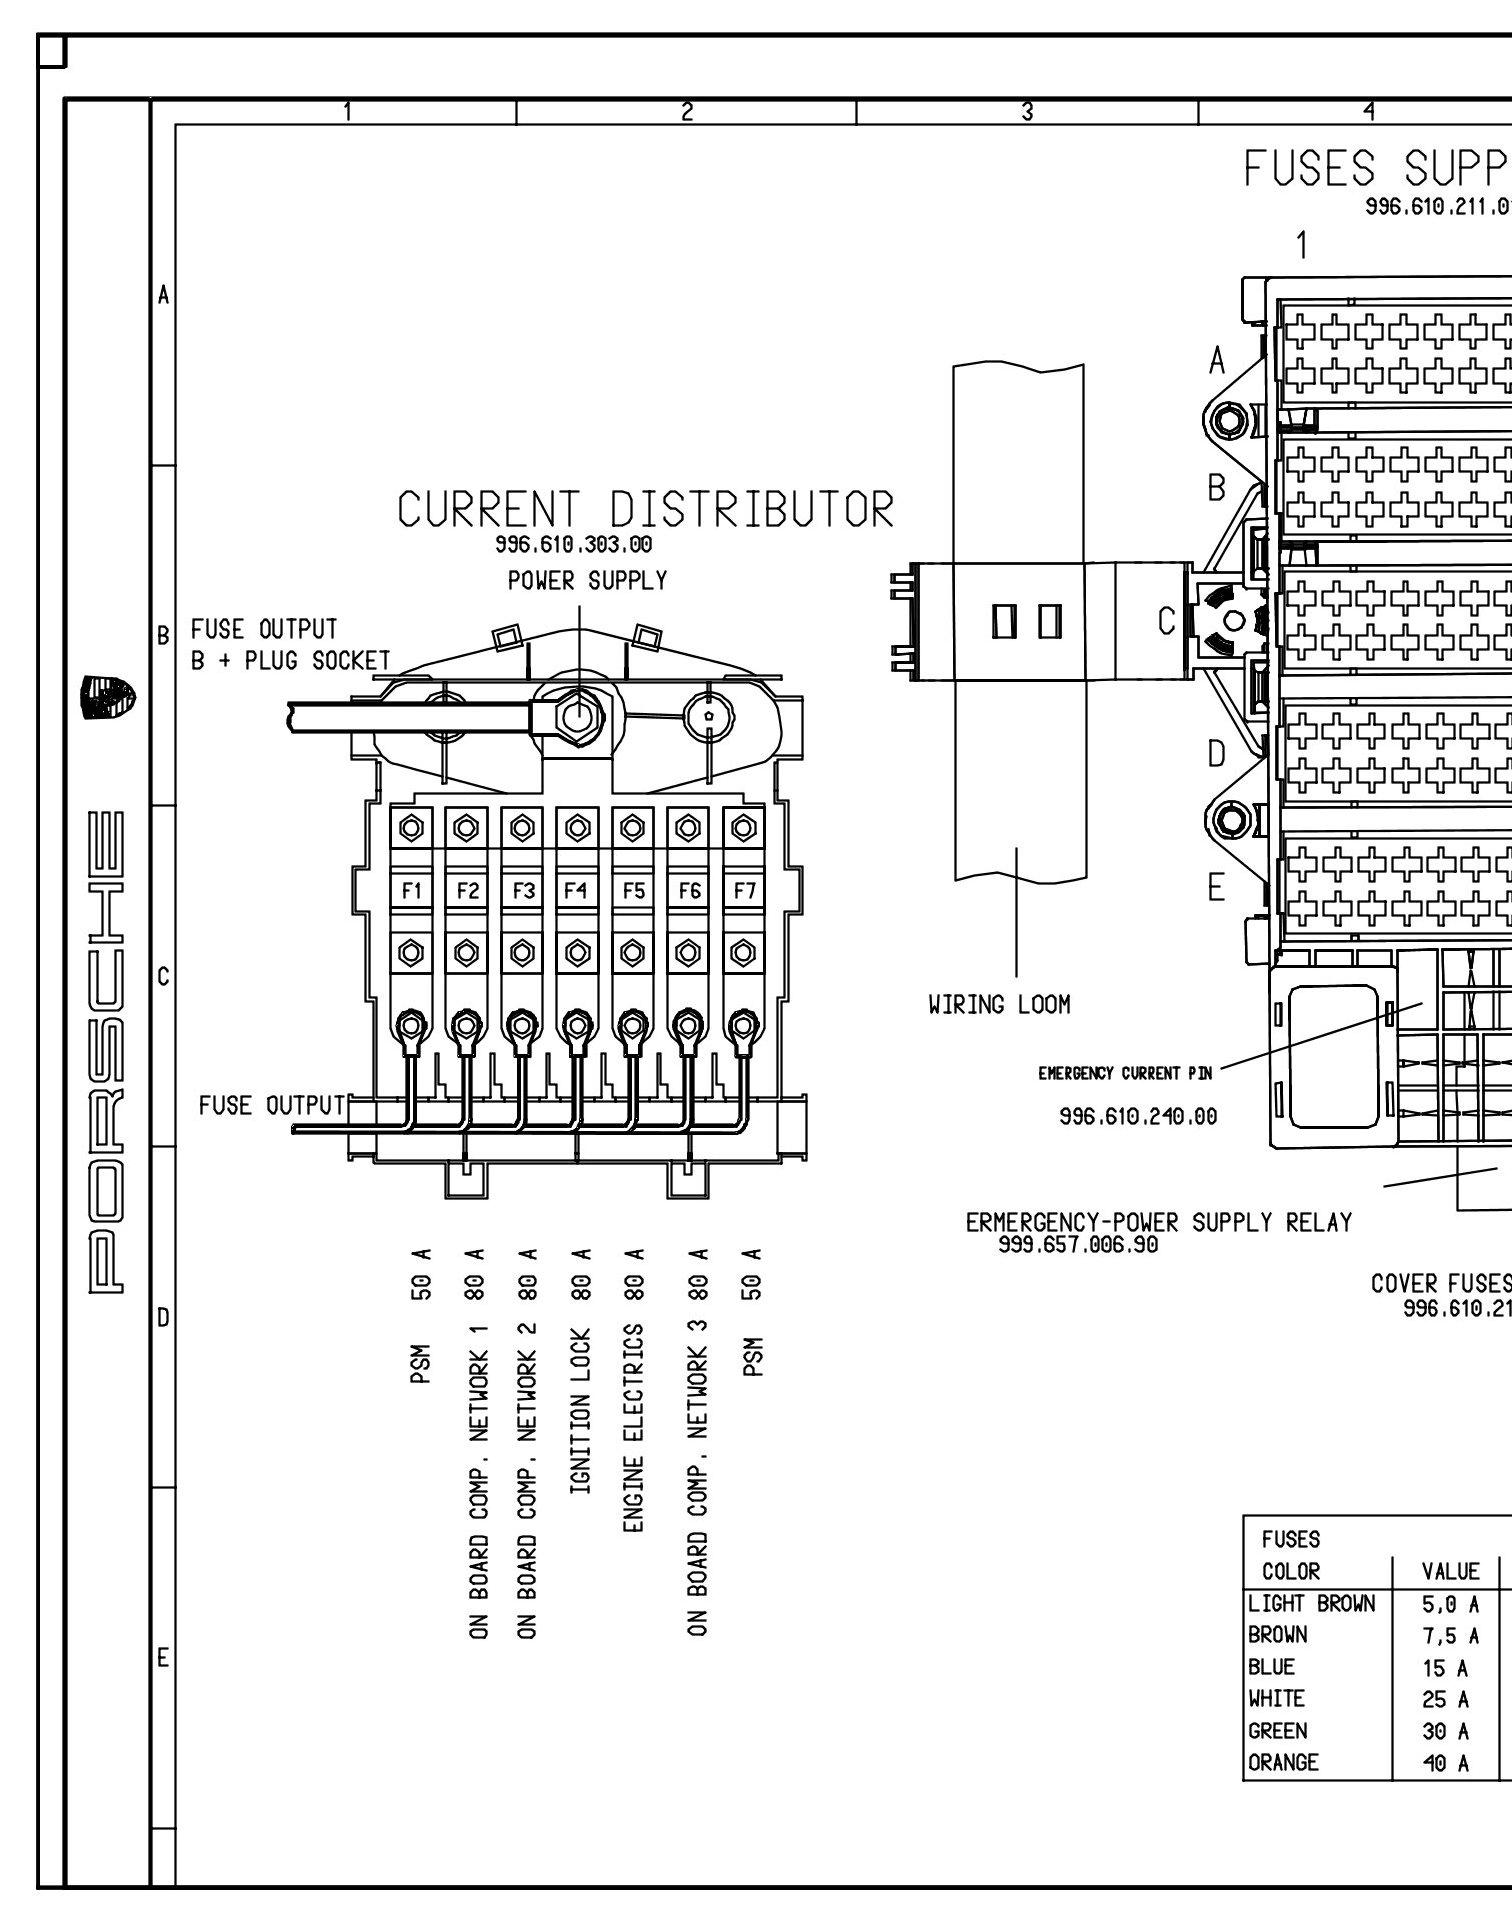 1998 porsche boxster fuse diagram basic guide wiring diagram u2022 rh needpixies com Porsche 996 Fuse Box Diagram 1998 porsche boxster fuse diagram